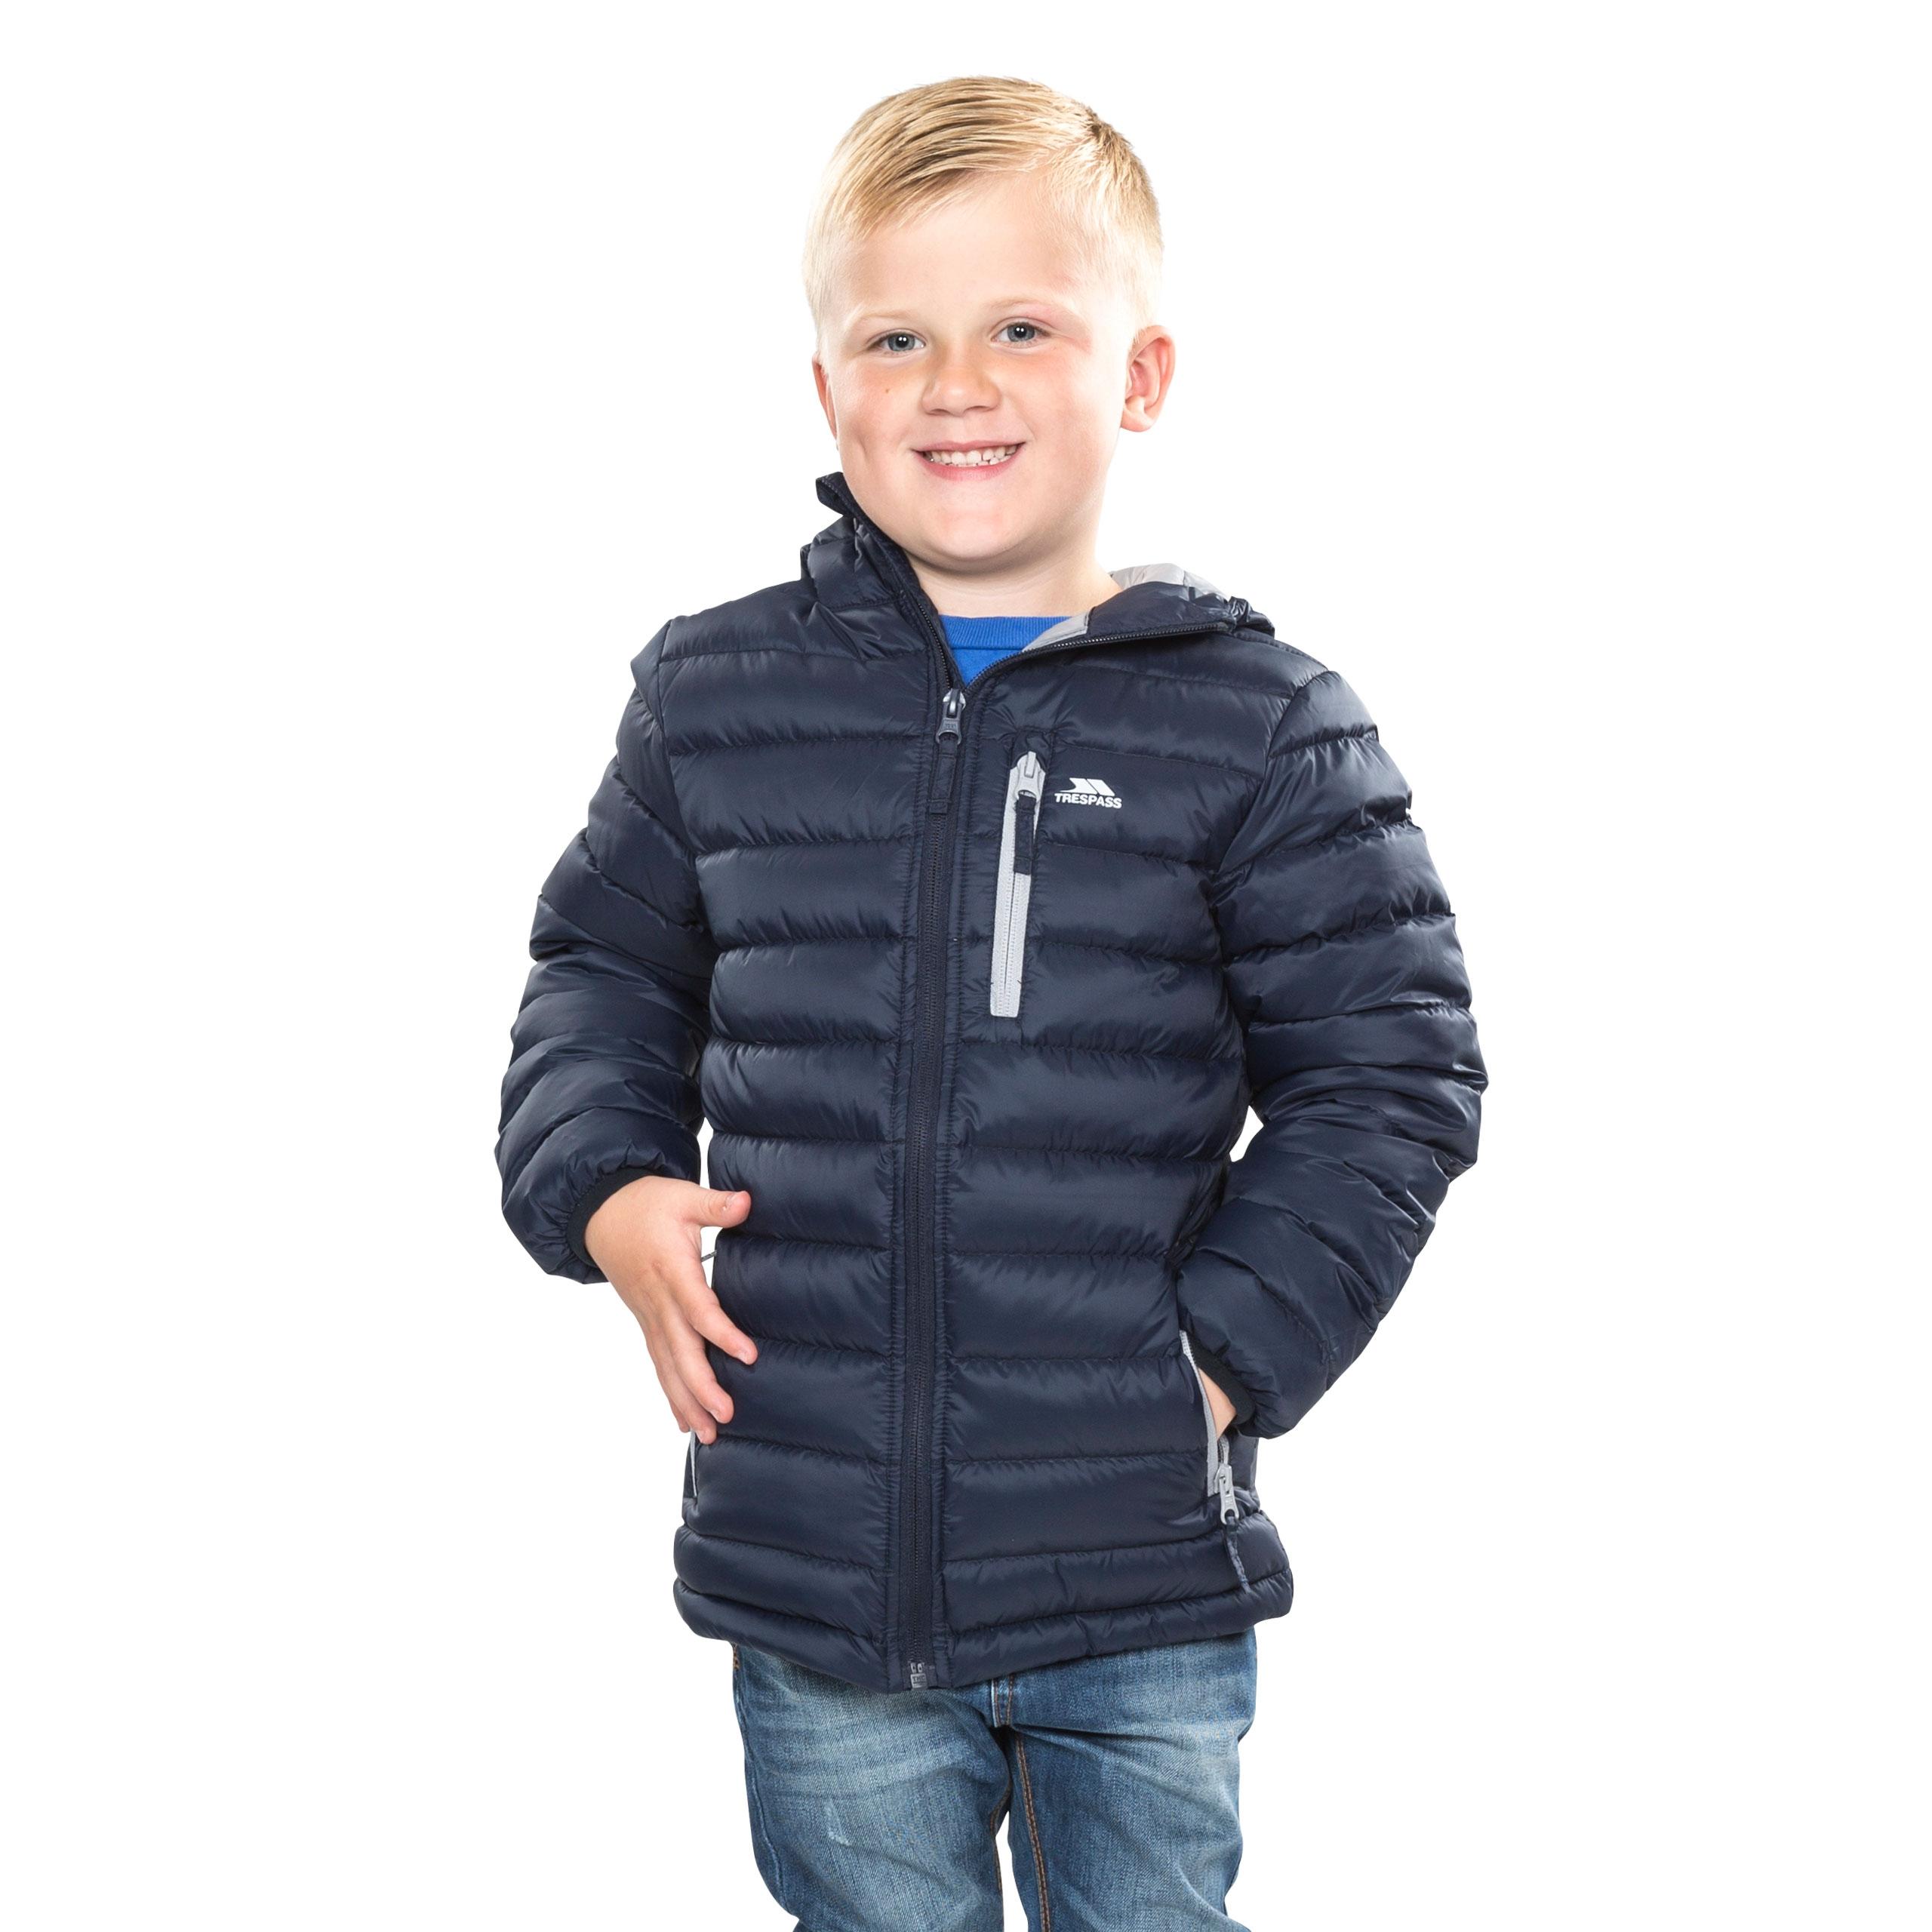 00ff7c471 Morley Kids  Down Jacket